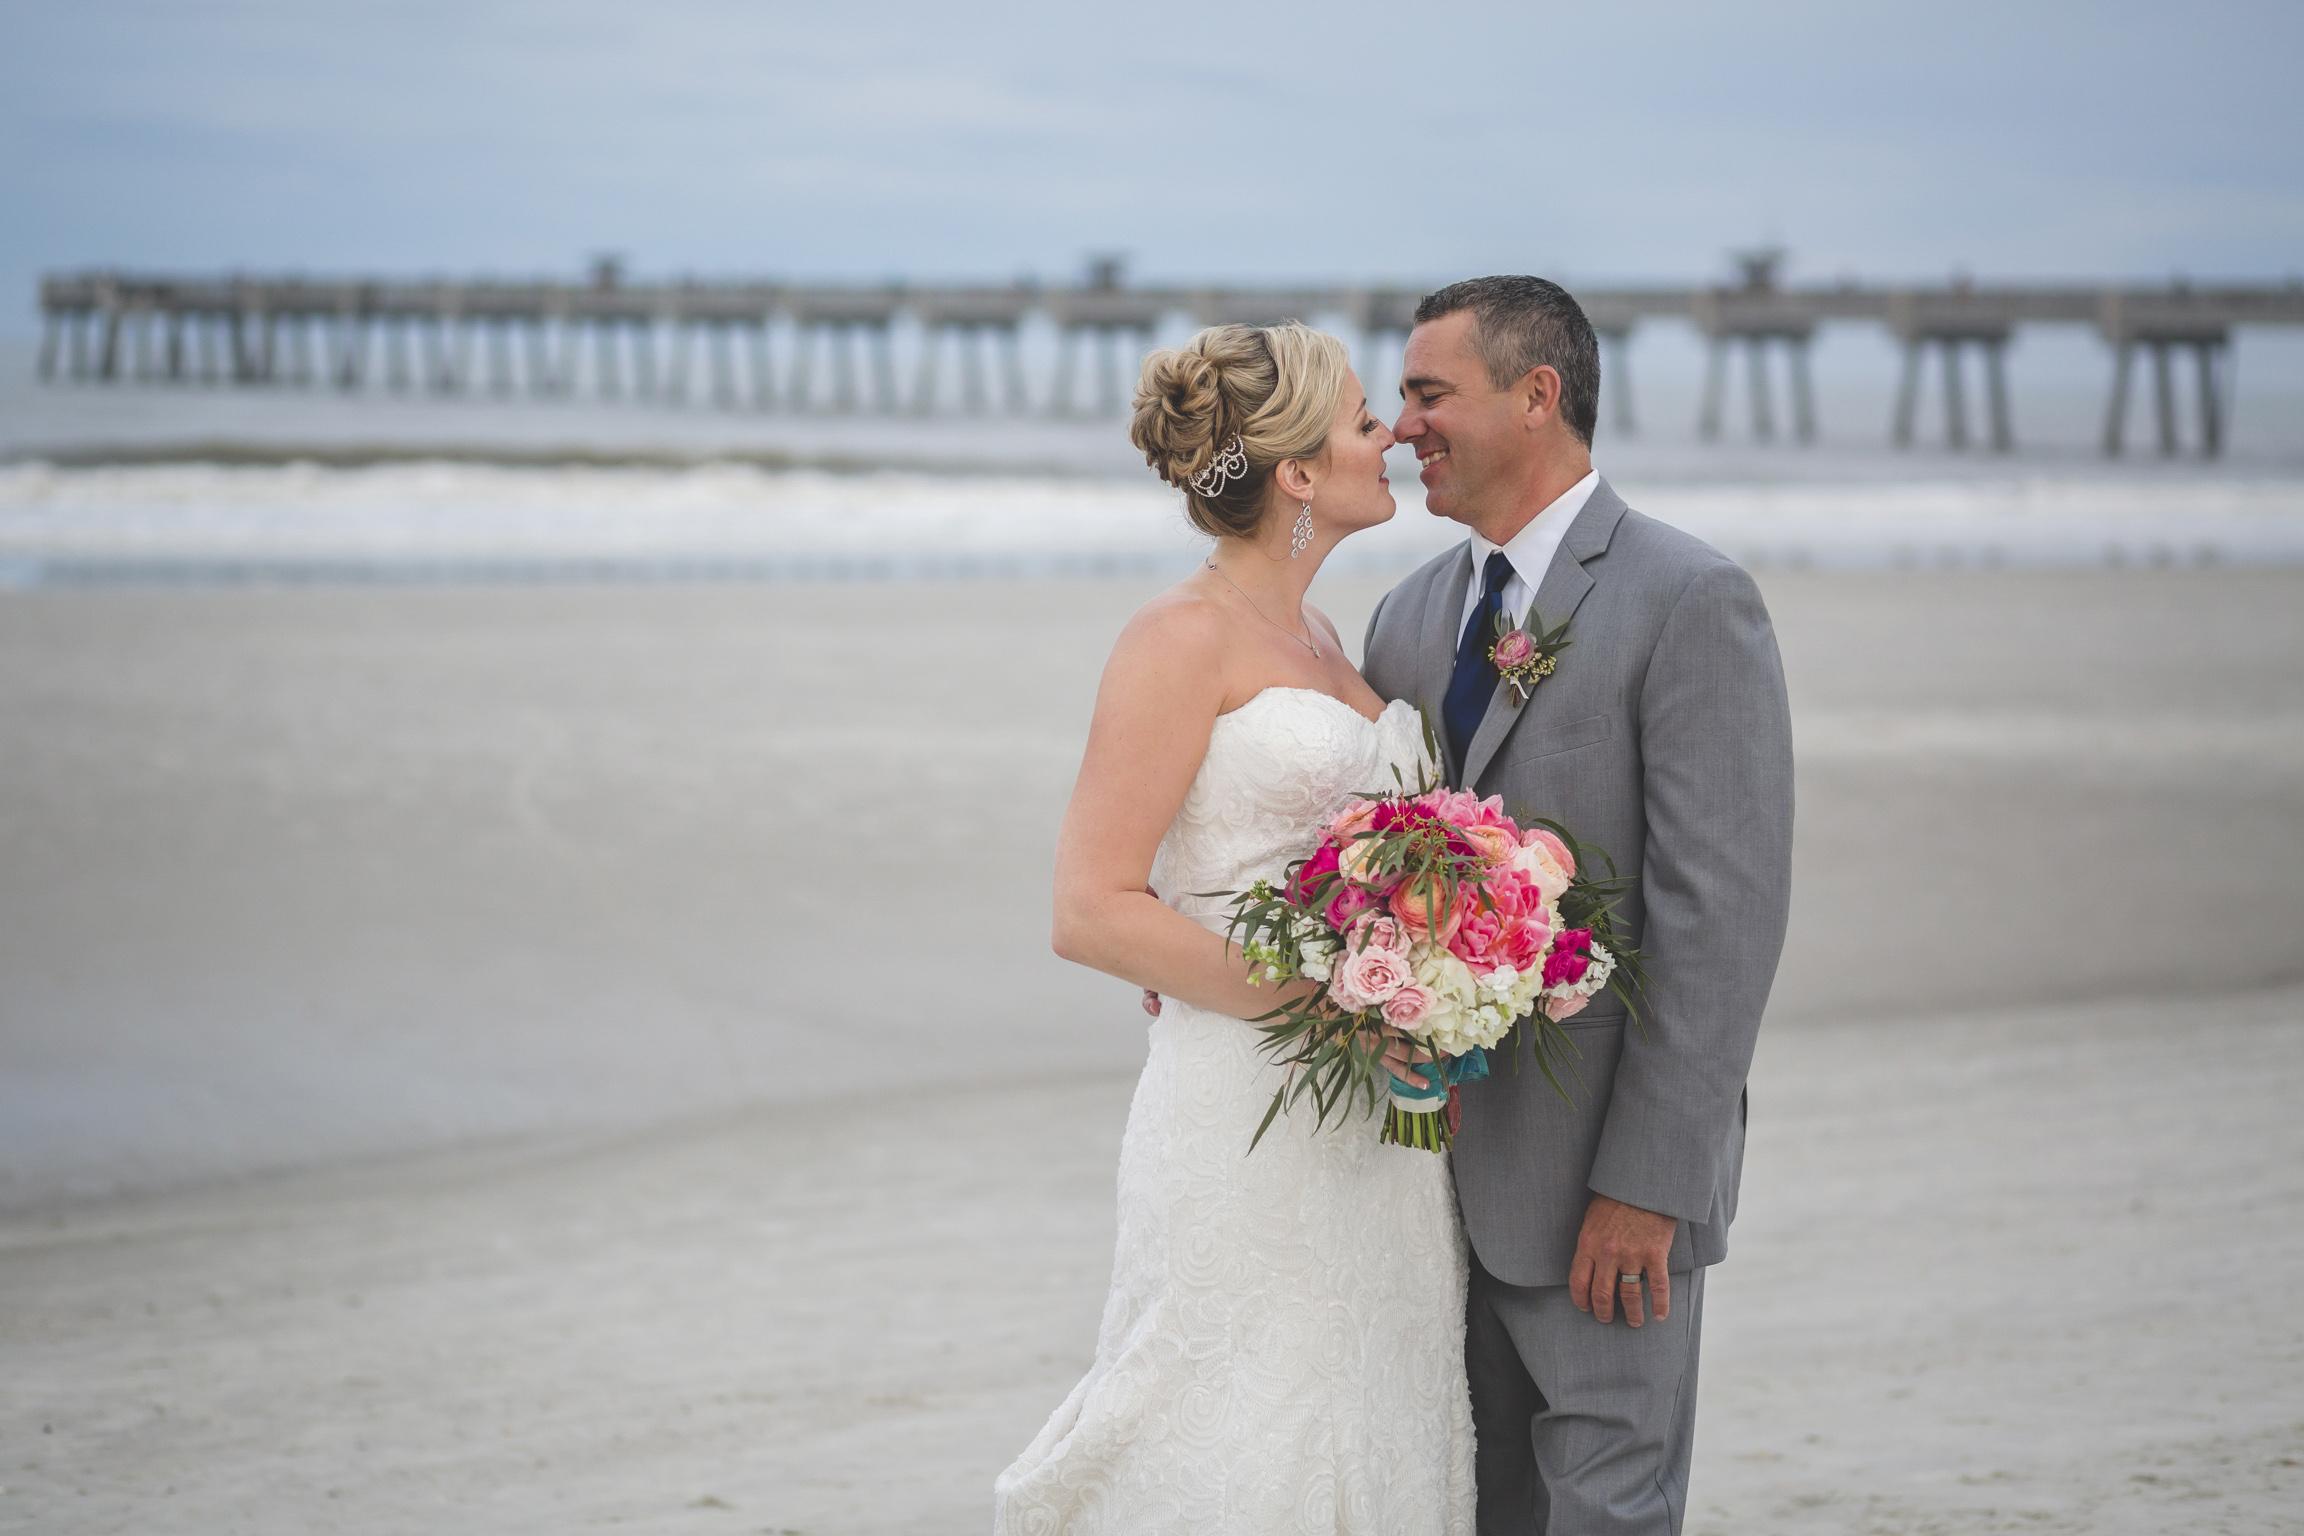 adam-szarmack-casa-marina-wedding-photographer-jacksonville-beach-florida-44.jpg